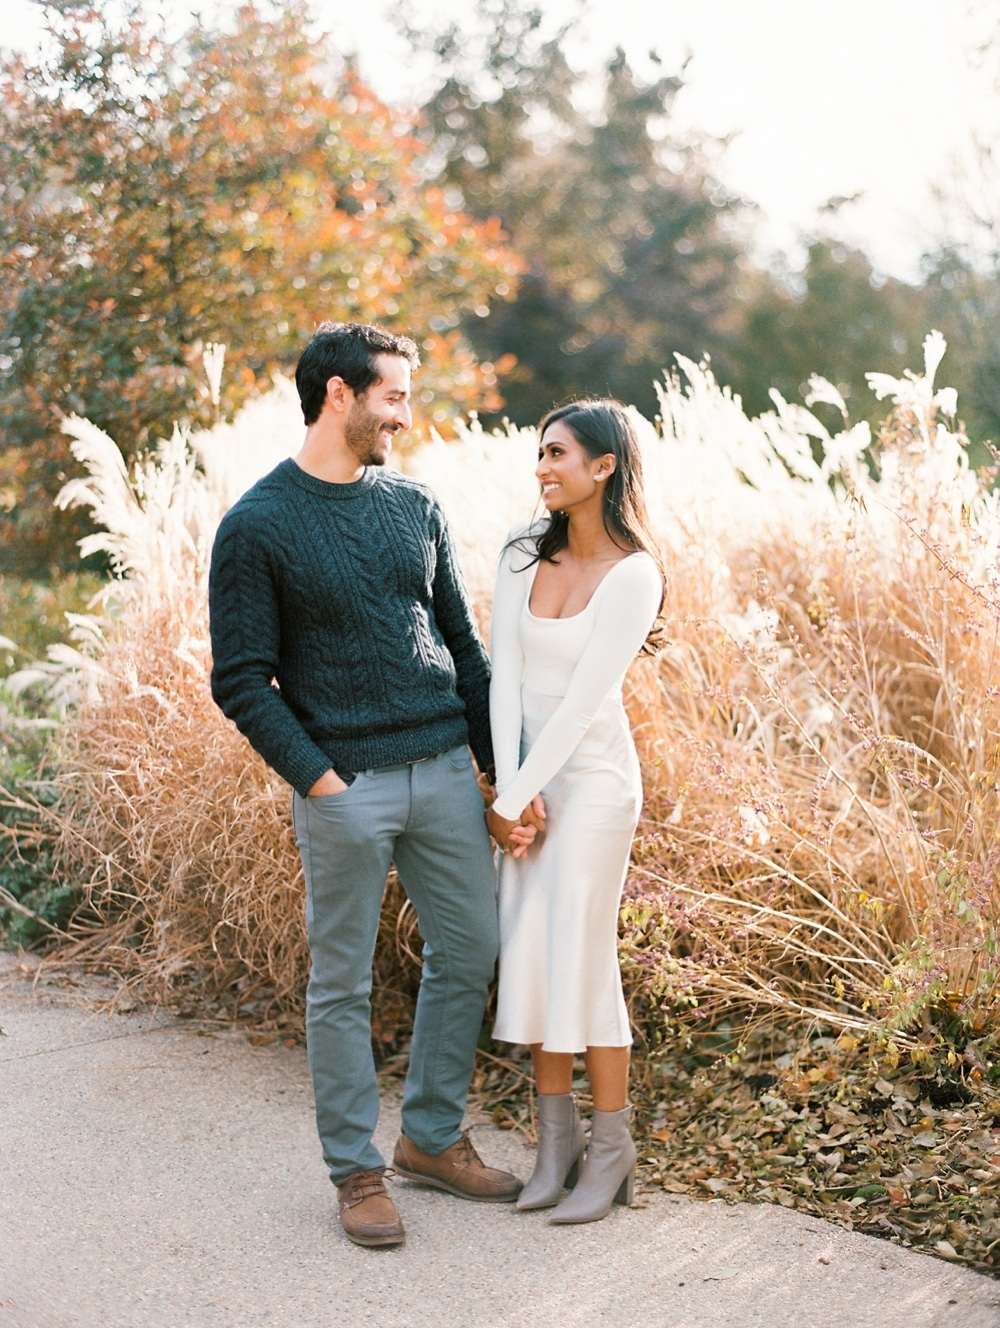 Kristin-La-Voie-Photography-morton-arboretum-chicago-wedding-photographer-62